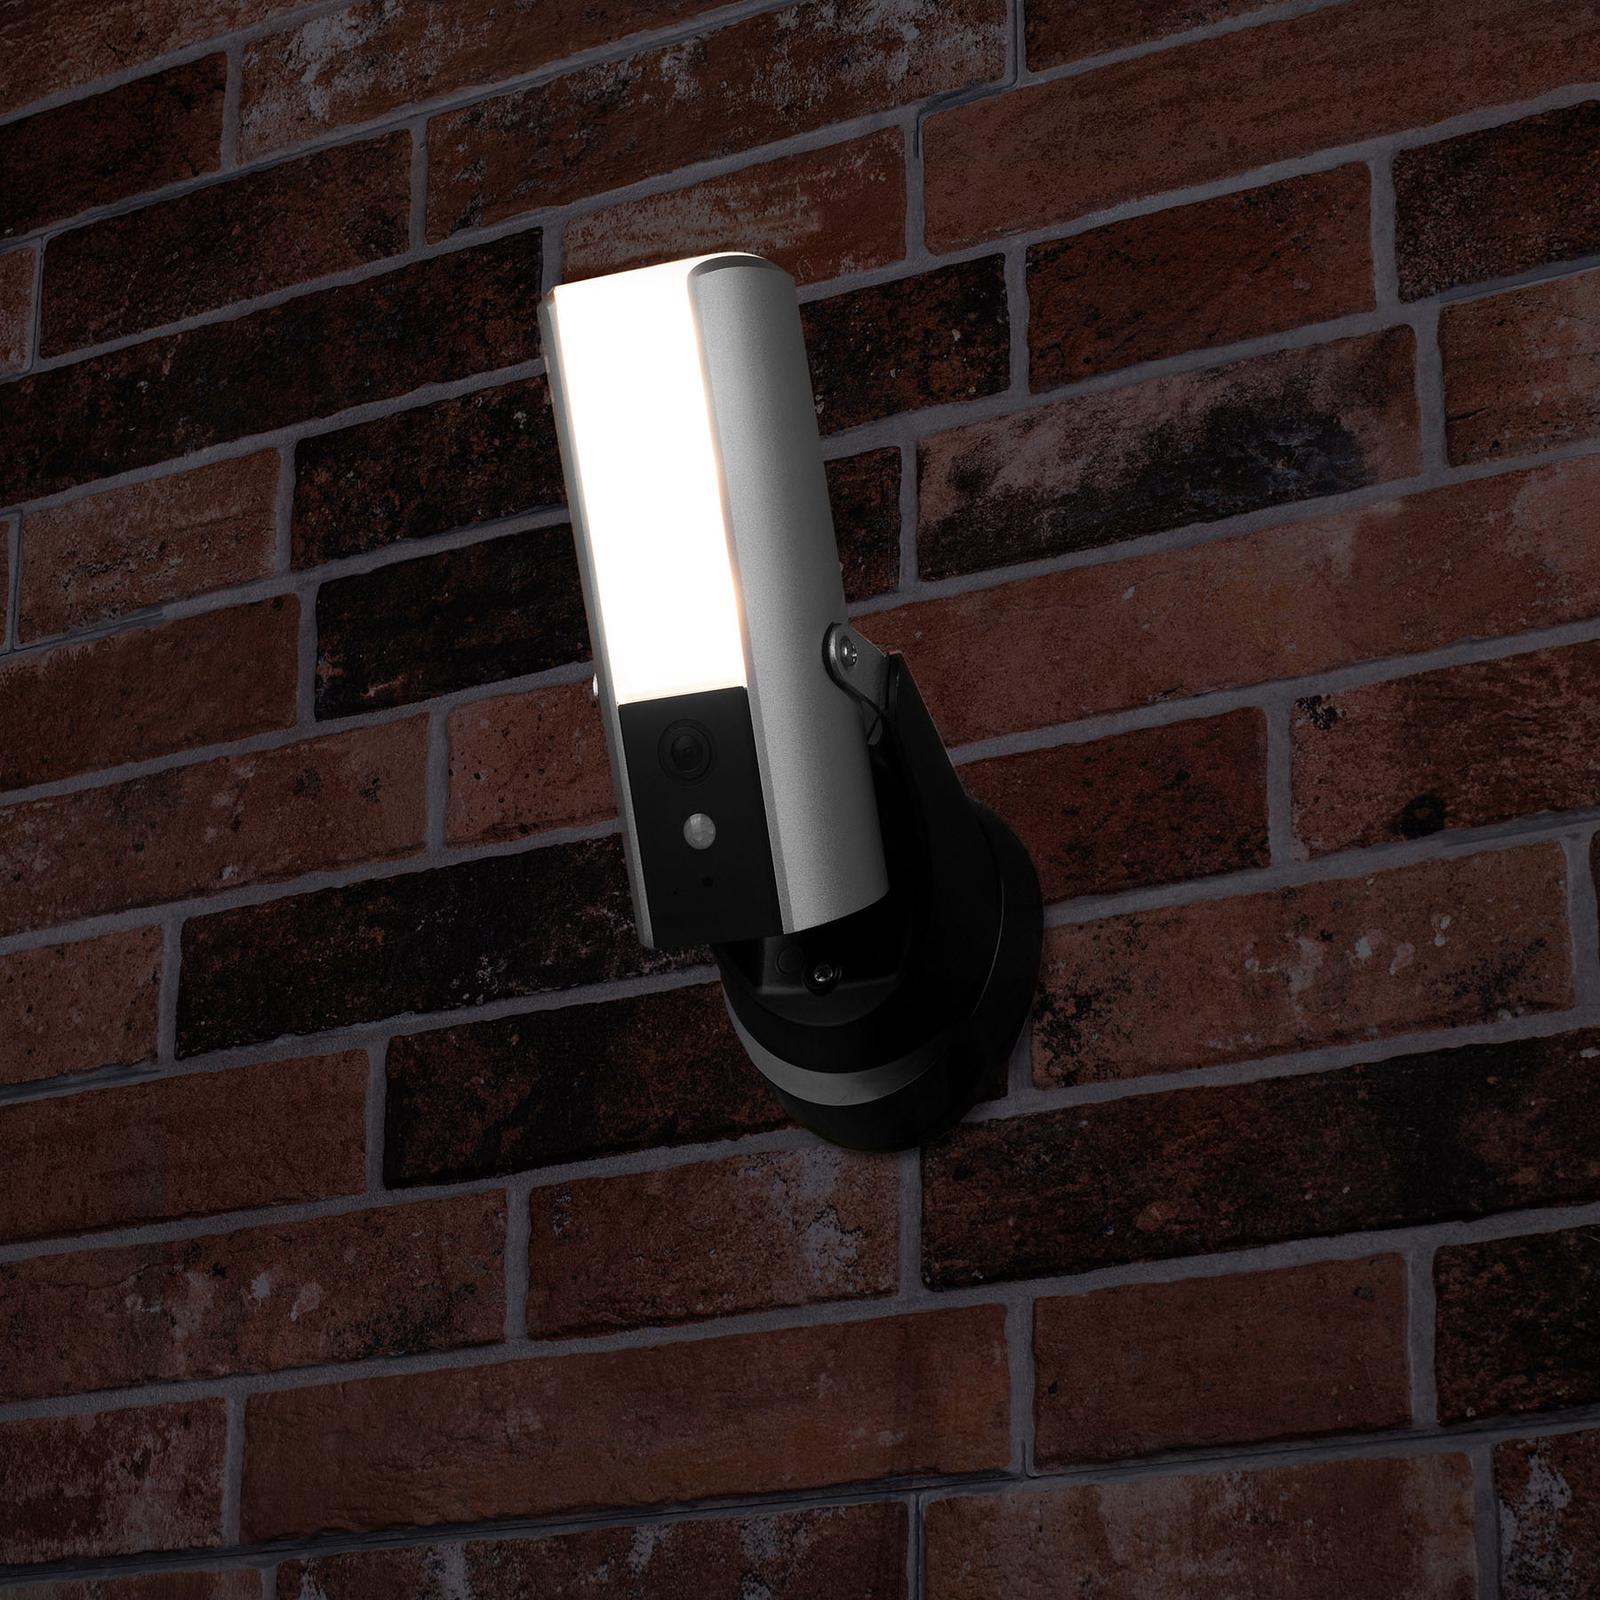 Overvåkningskamera Guardian med LED-lys